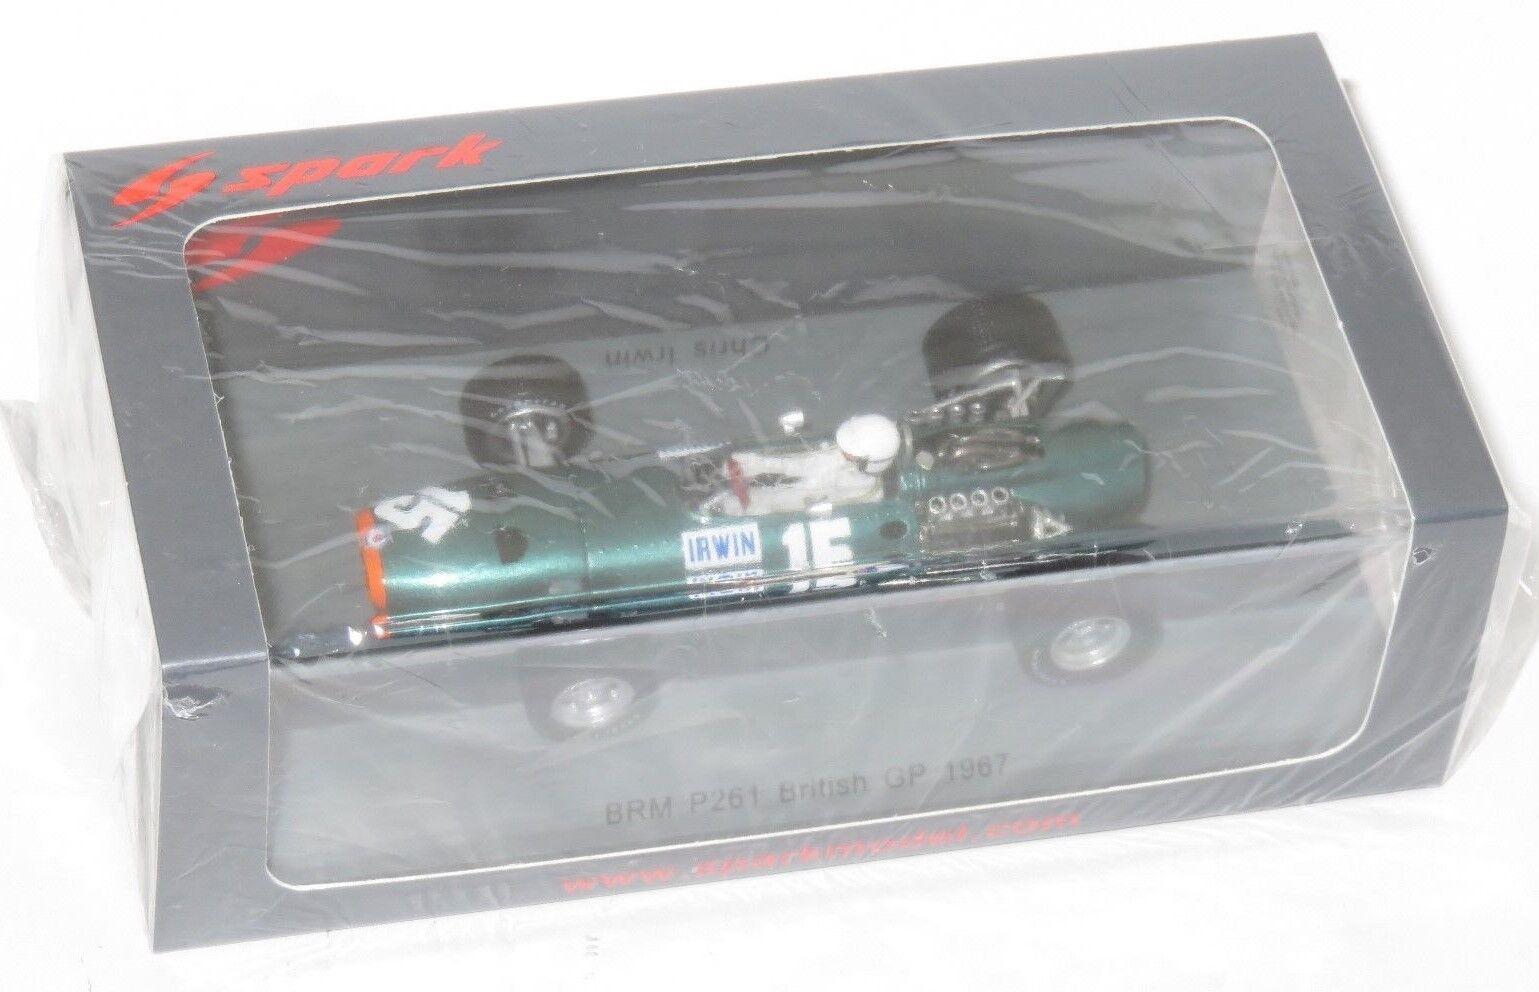 1 43 Spark MODEL BRM P261 British GP 1967 Chris Irwin